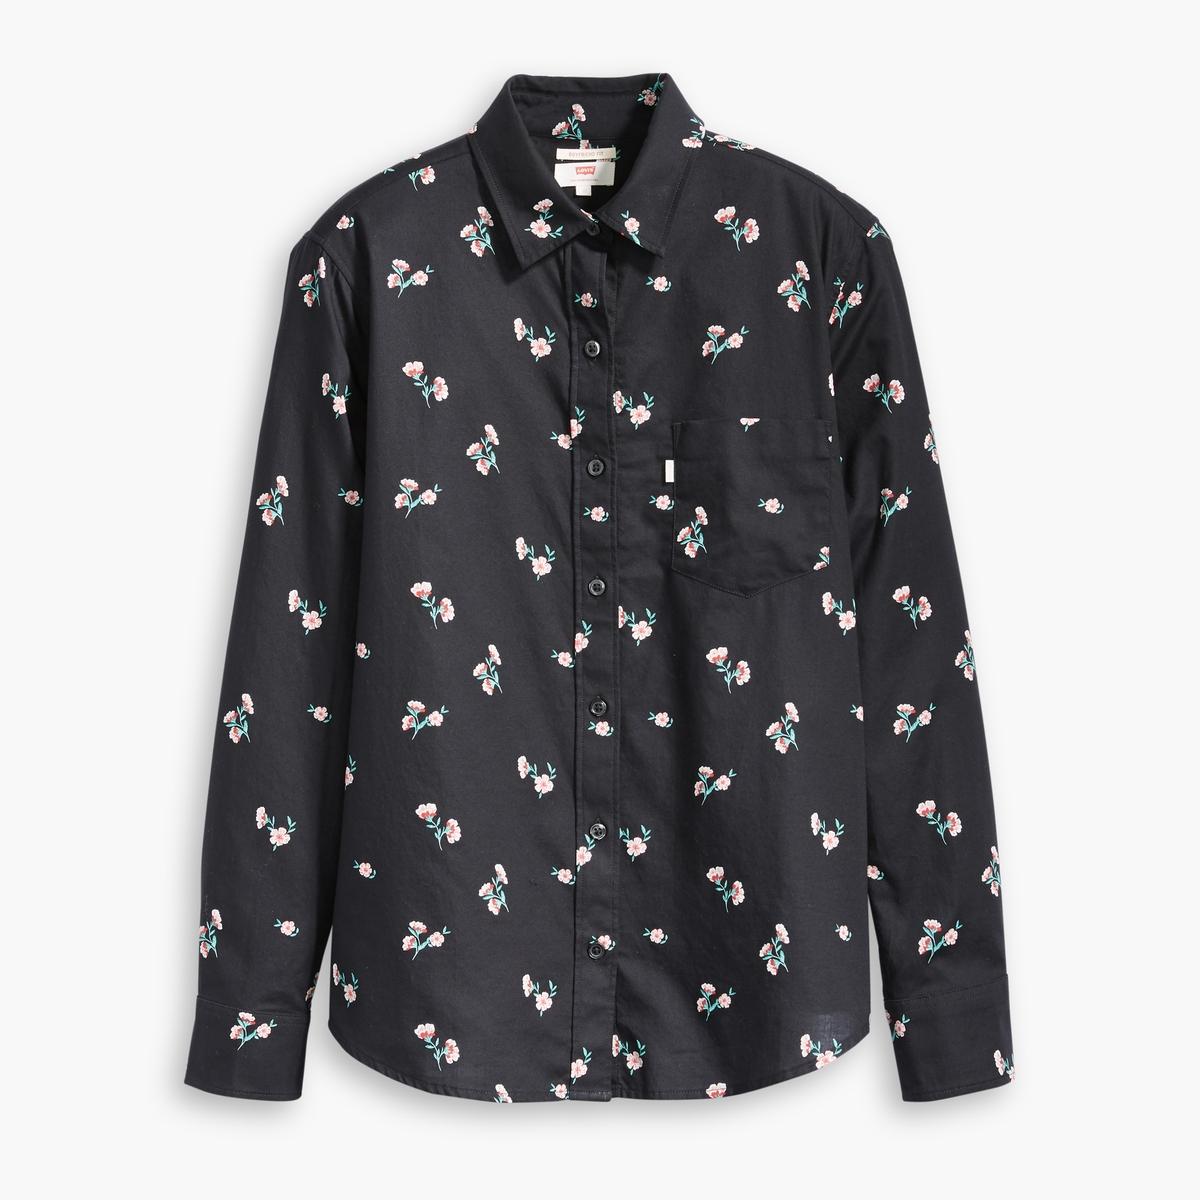 Camisa de manga larga con bolsillo en el pecho ULTIMATE B